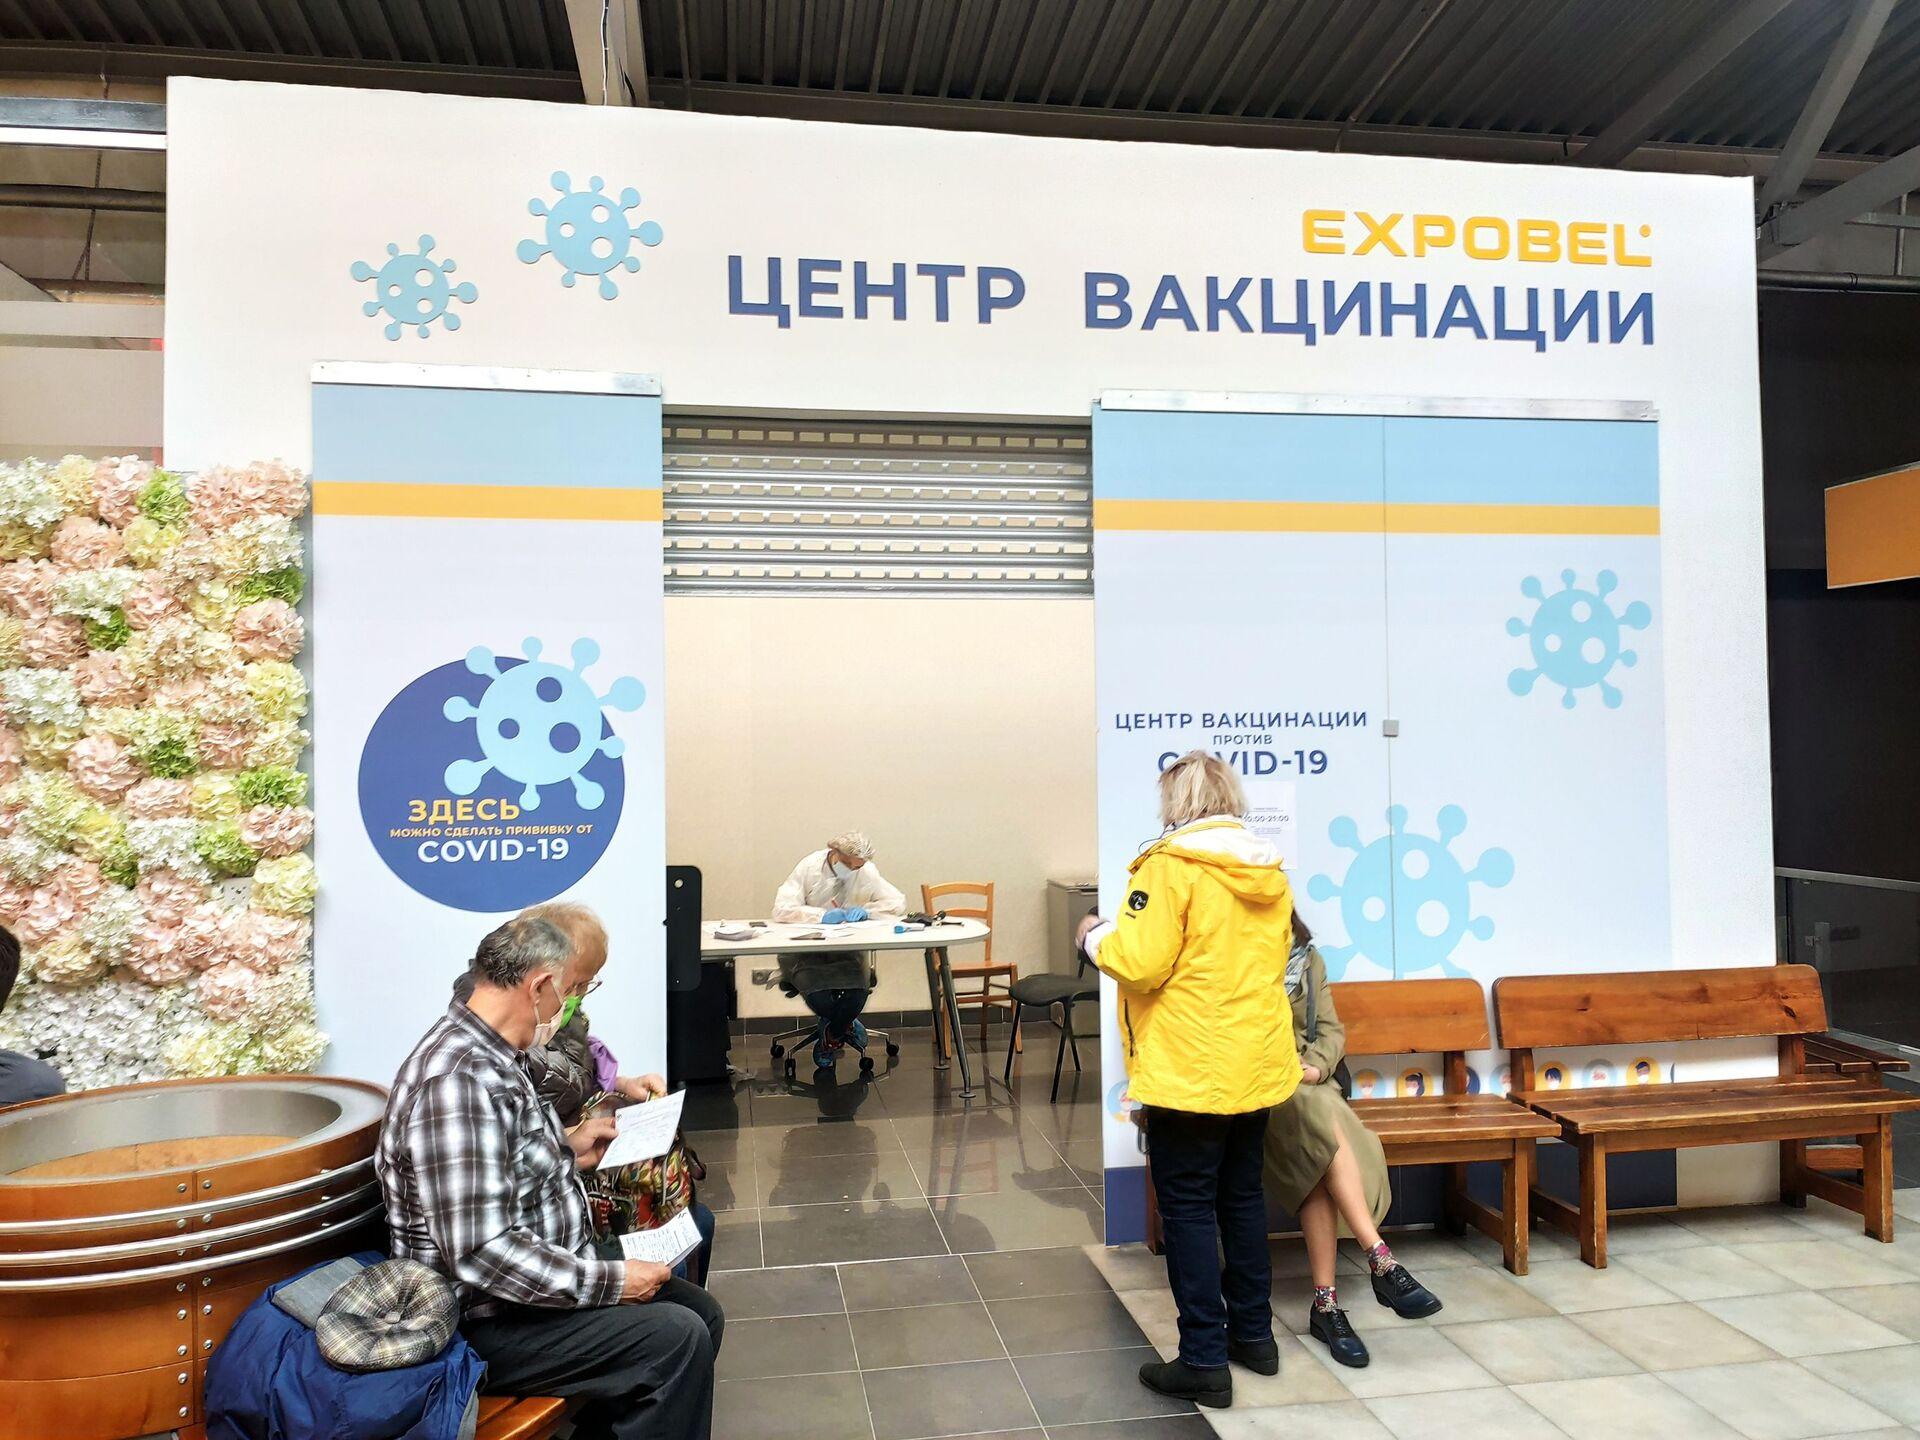 Центр вакцинации - Sputnik Беларусь, 1920, 29.06.2021